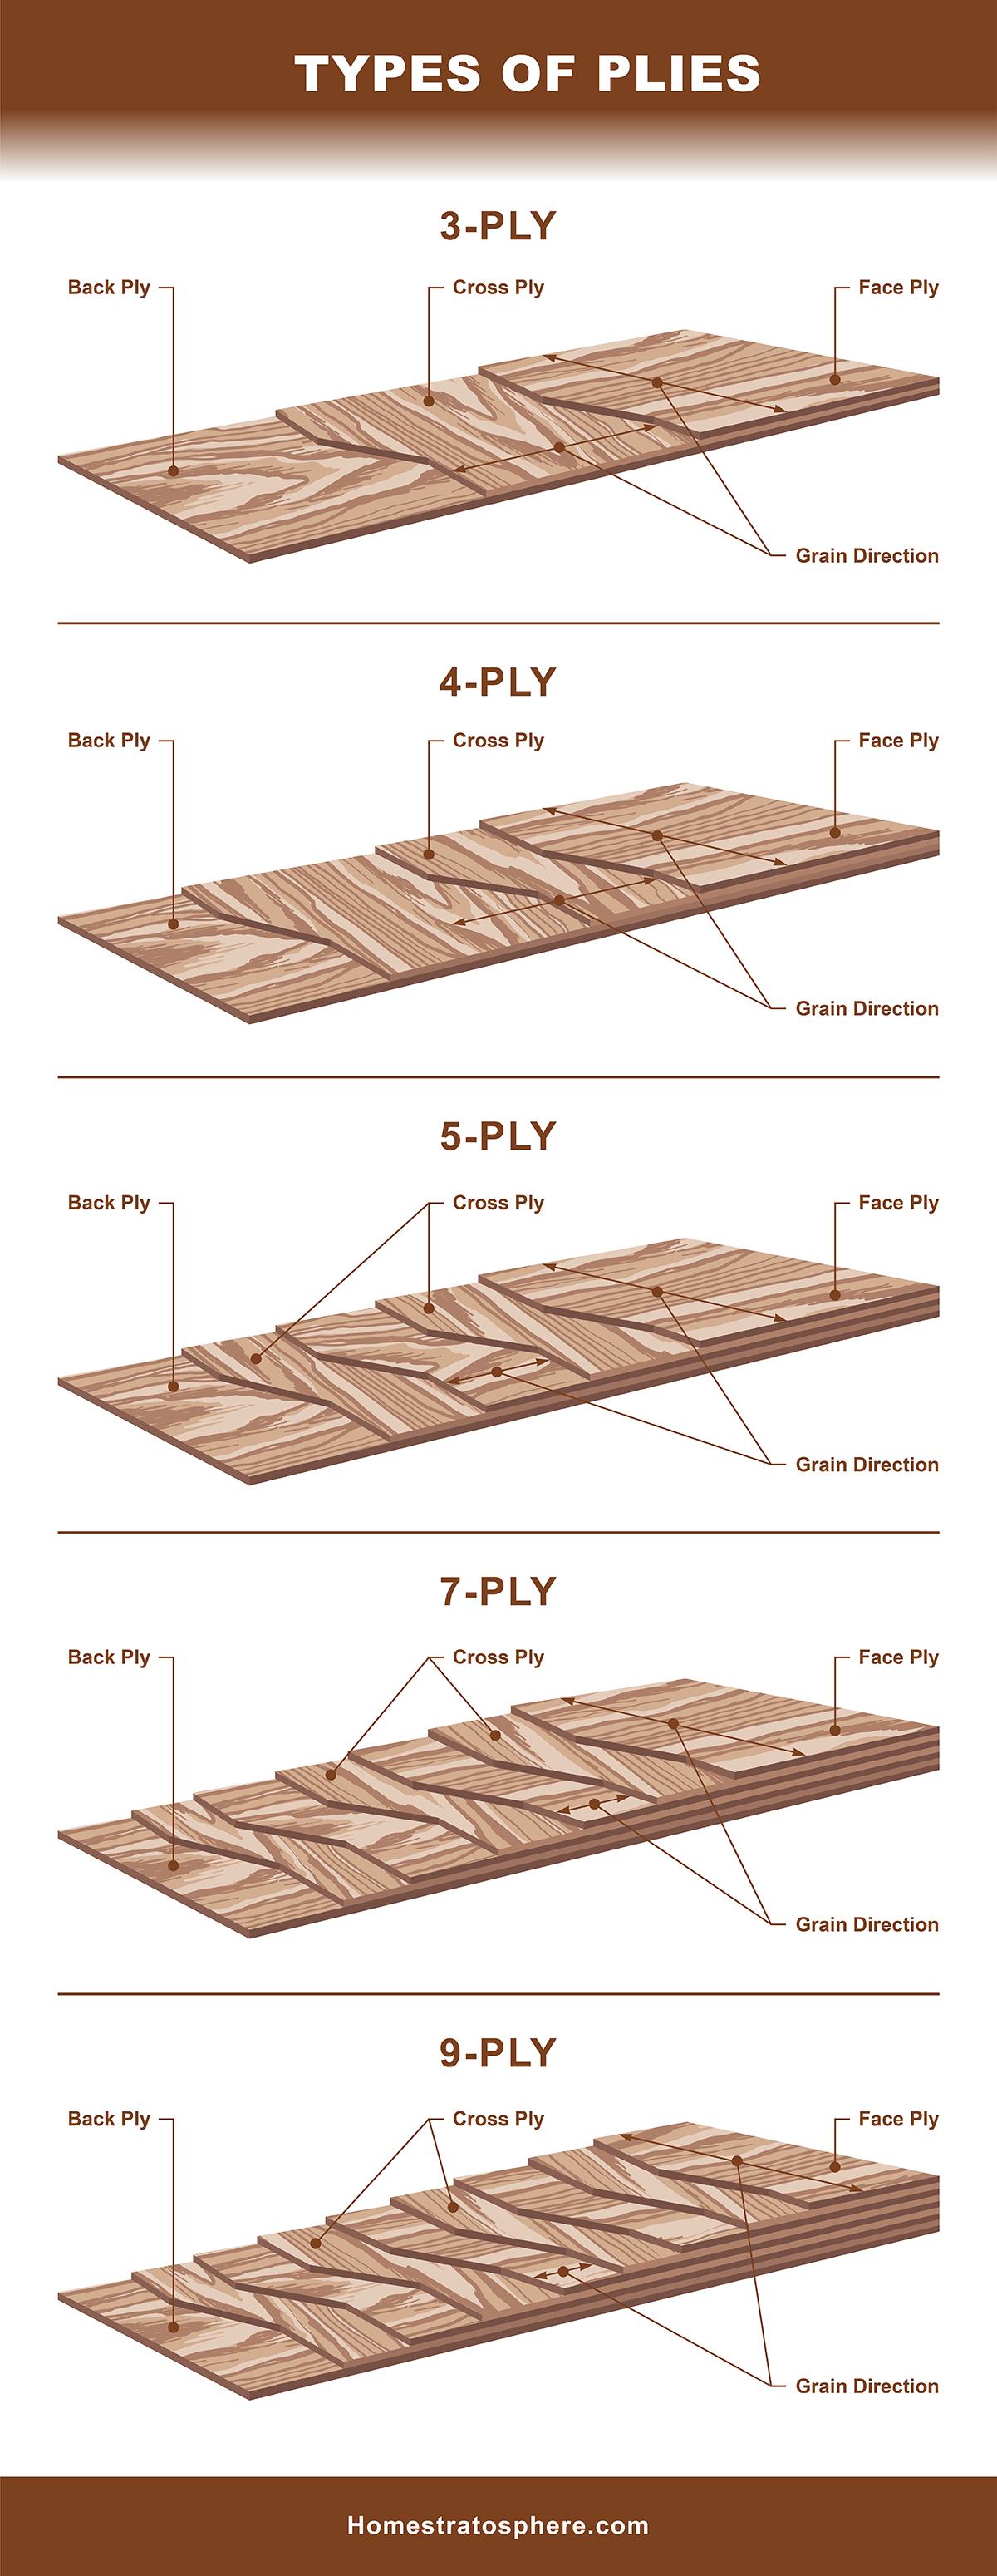 Types of Plies